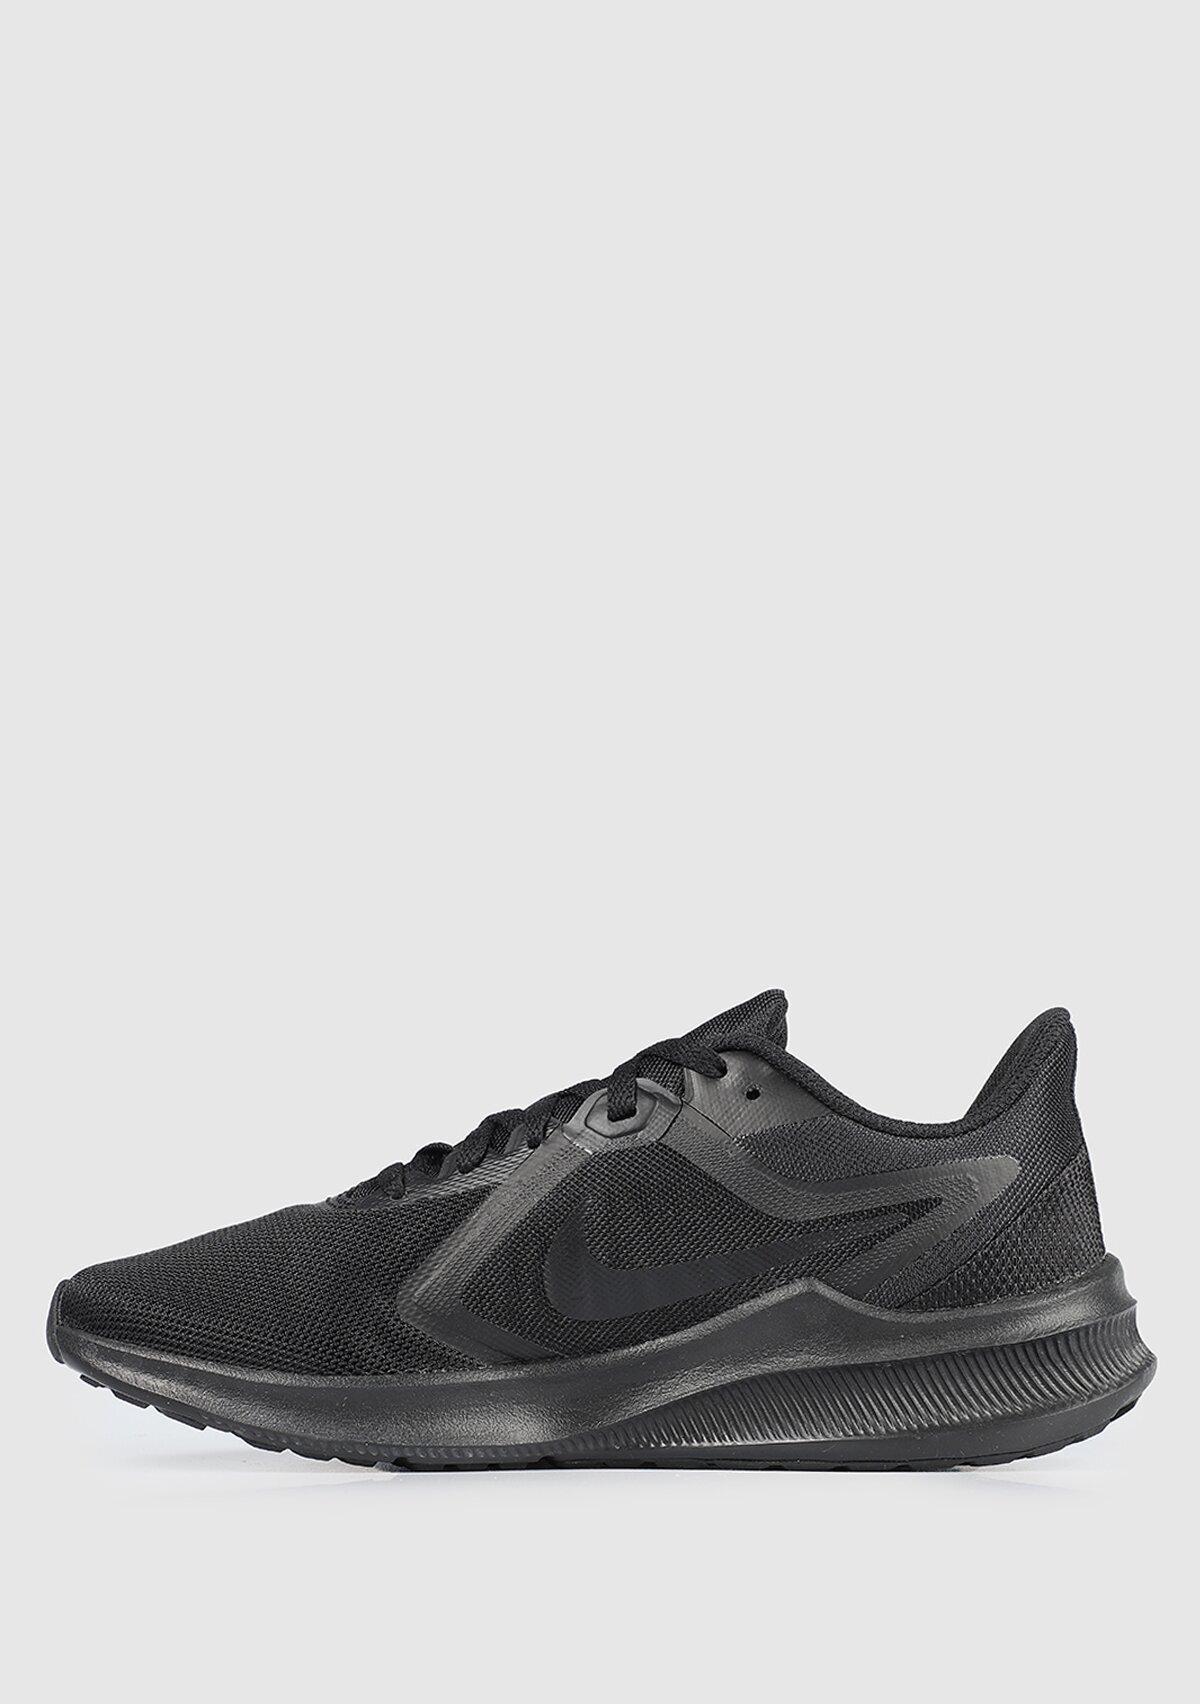 resm Wmns Downshifter 10 Siyah Kadın Koşu Ayakkabısı Cı9984-003